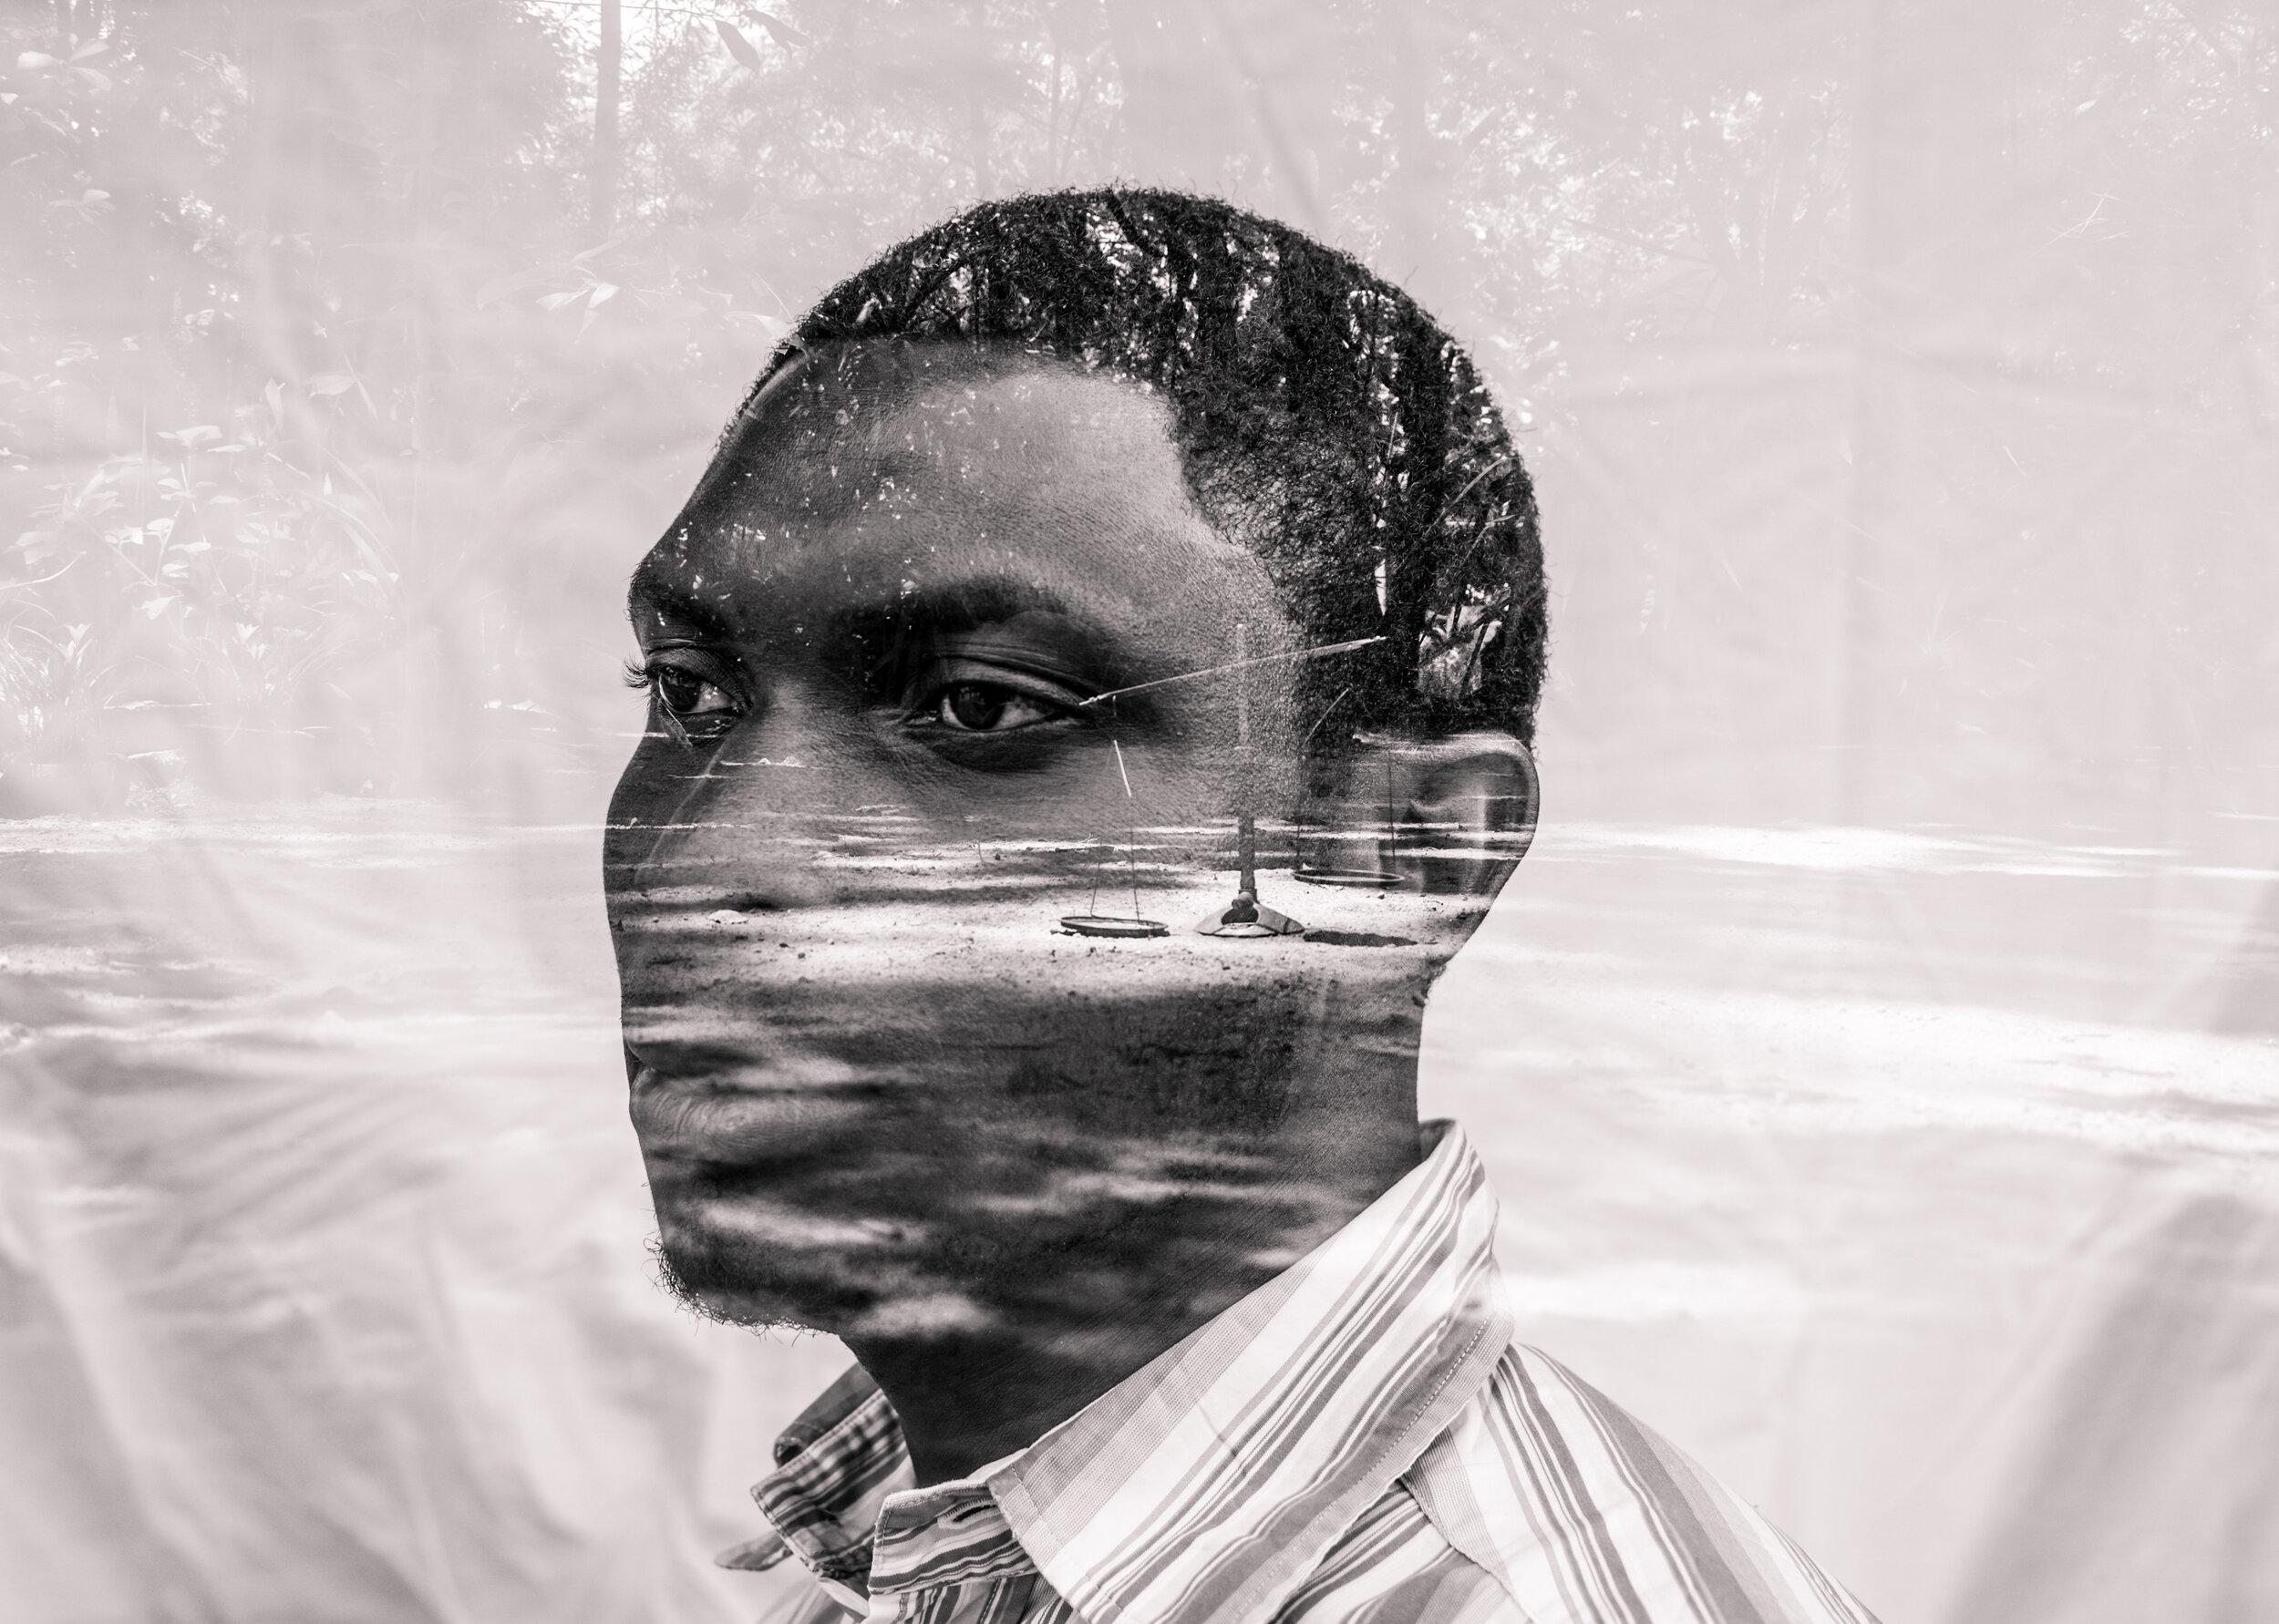 Abdul-Razak Salisu, 27, Kaduna, Nigeria